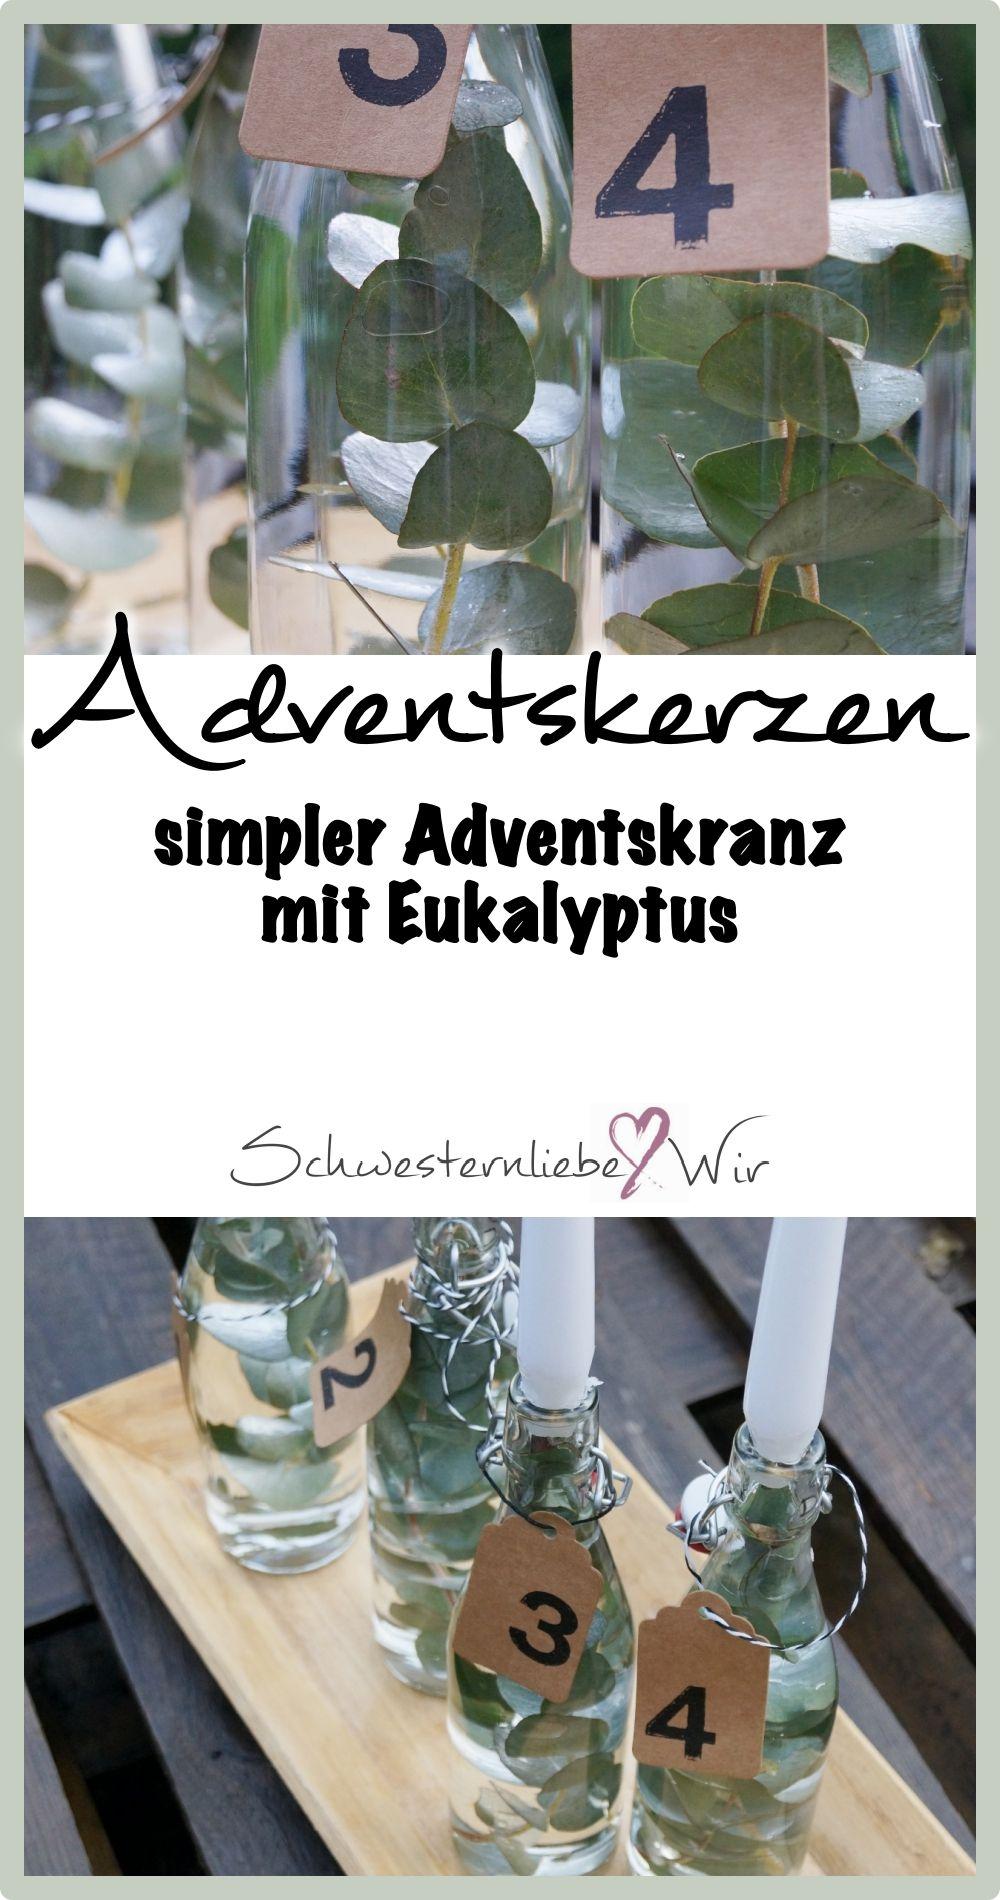 advent simpler adventskranz mit eukalyptus. Black Bedroom Furniture Sets. Home Design Ideas